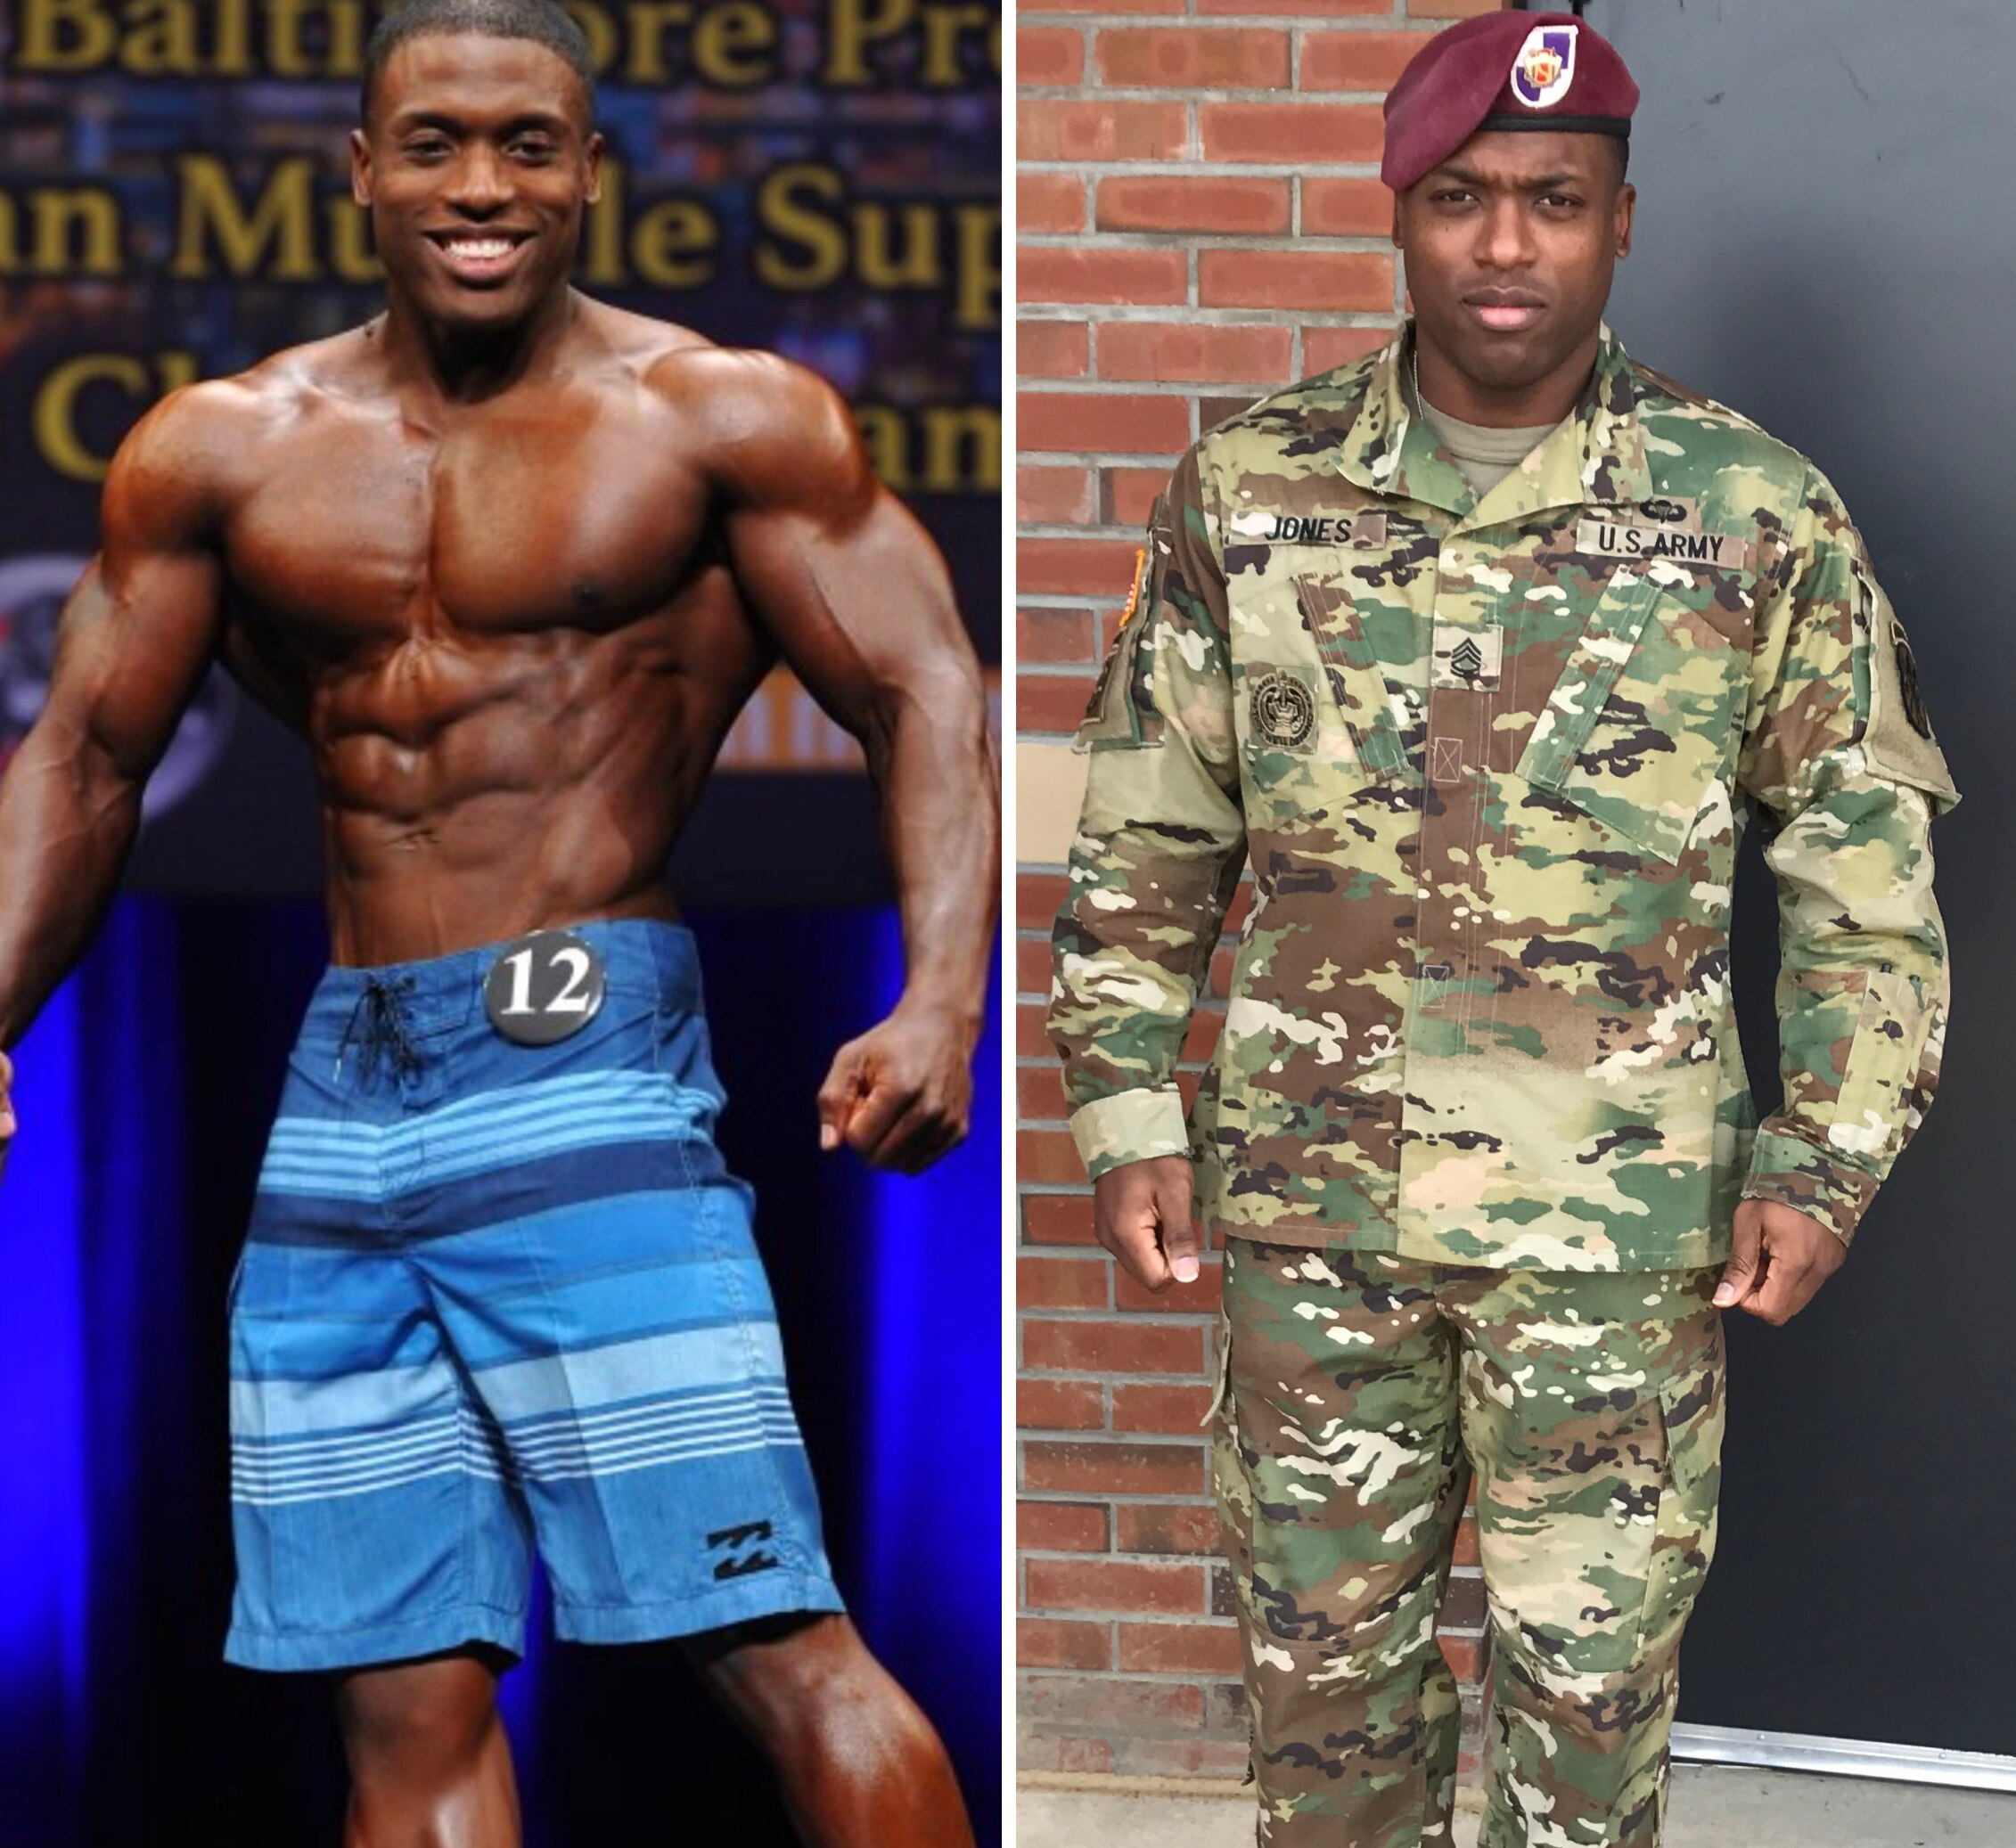 Army Sgt. 1st Class Dante Jones